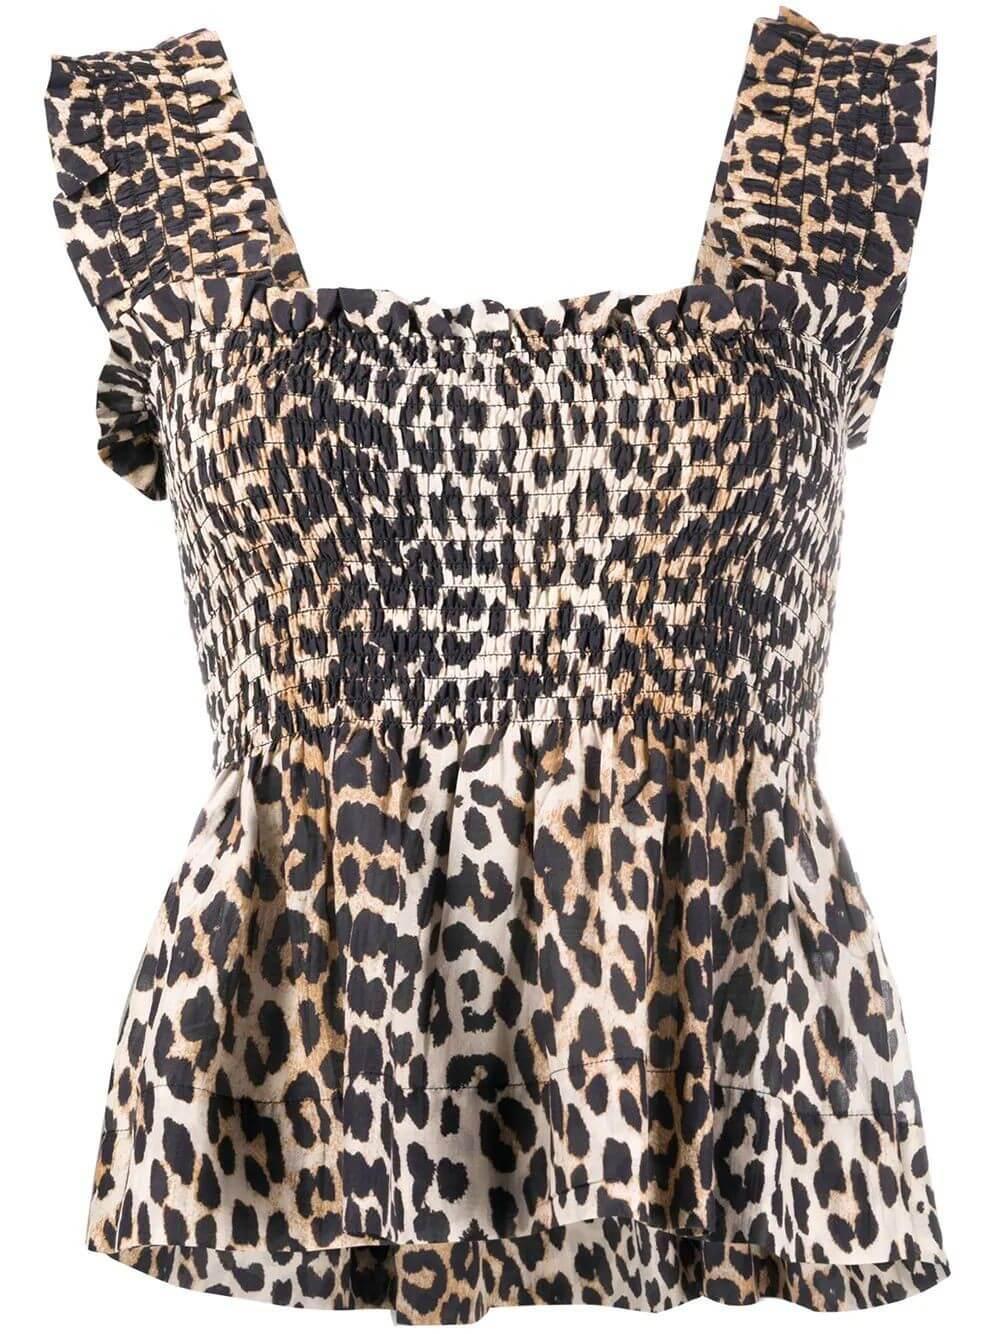 Leopard Peplum Ruched Sleeveless Top